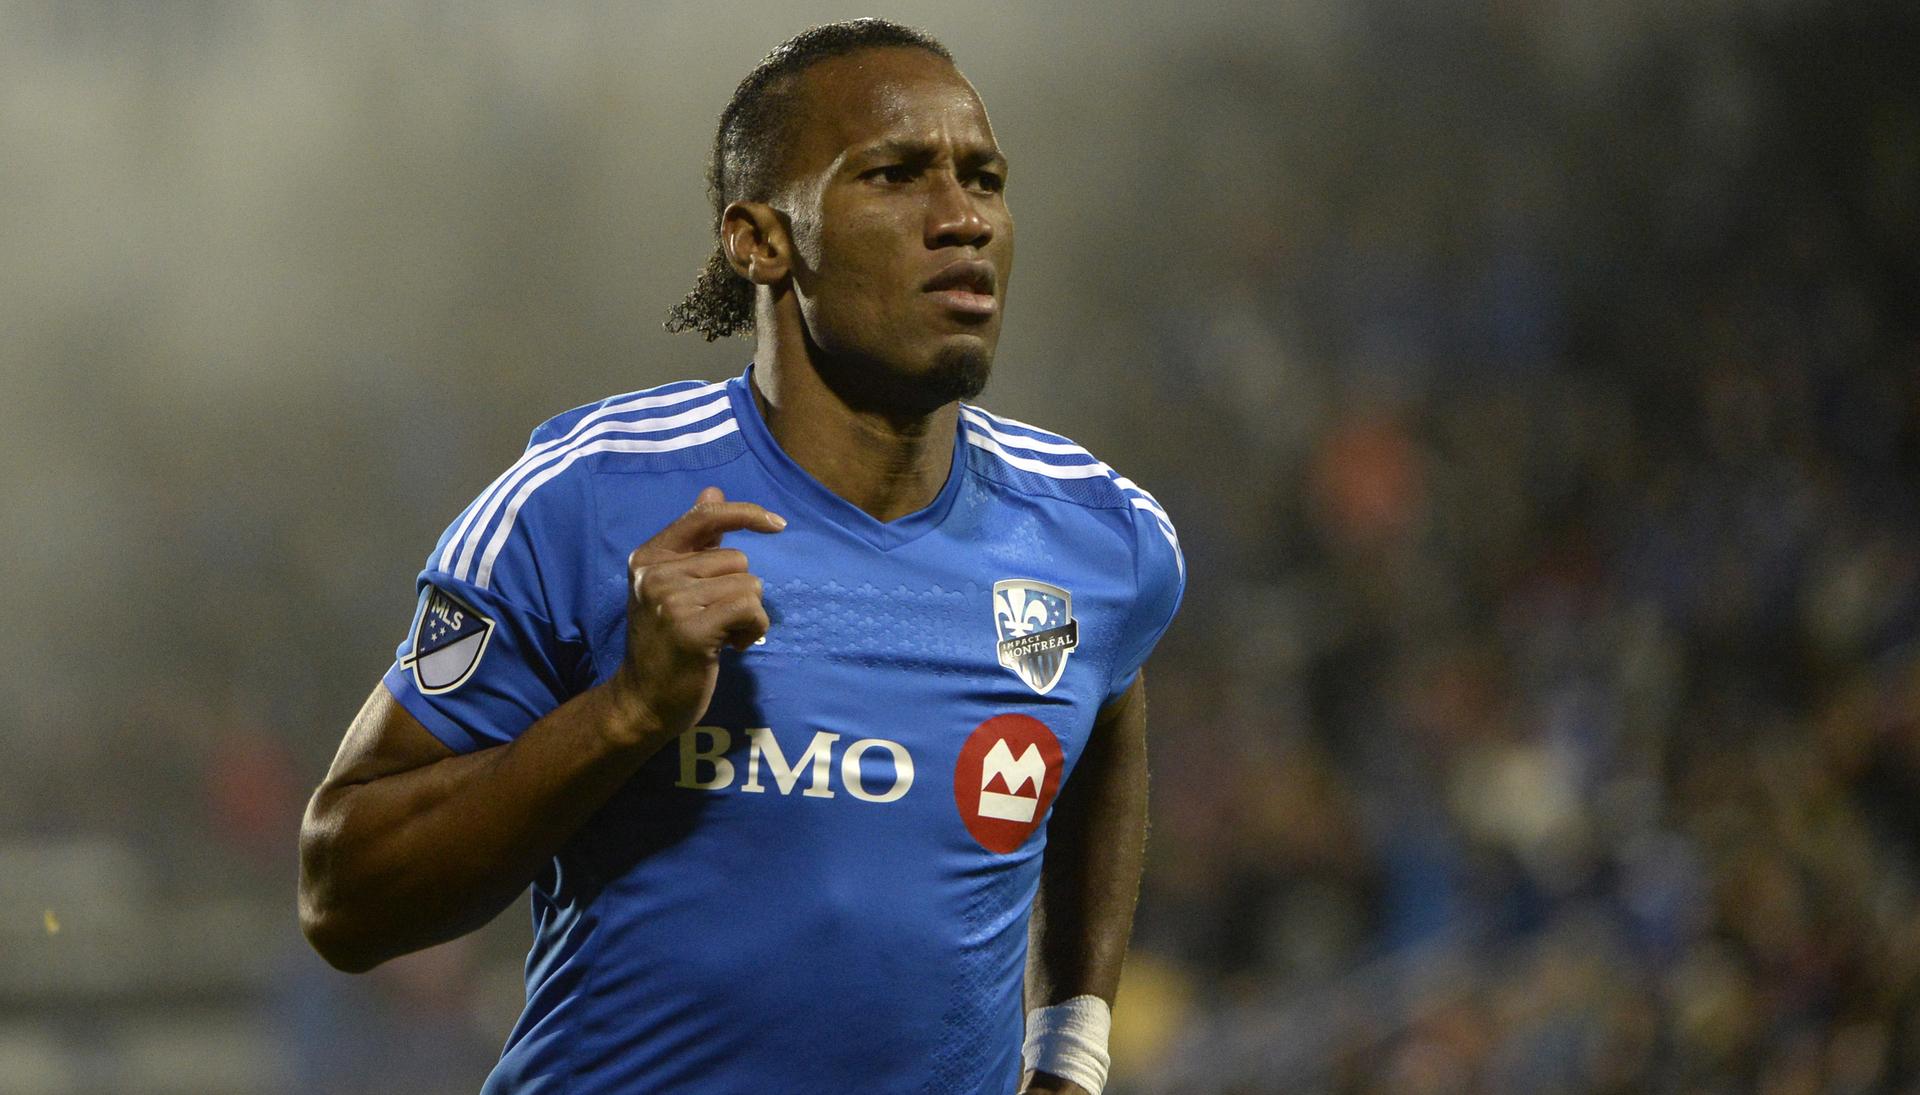 Di r Drogba Montreal Impact MLS Goal